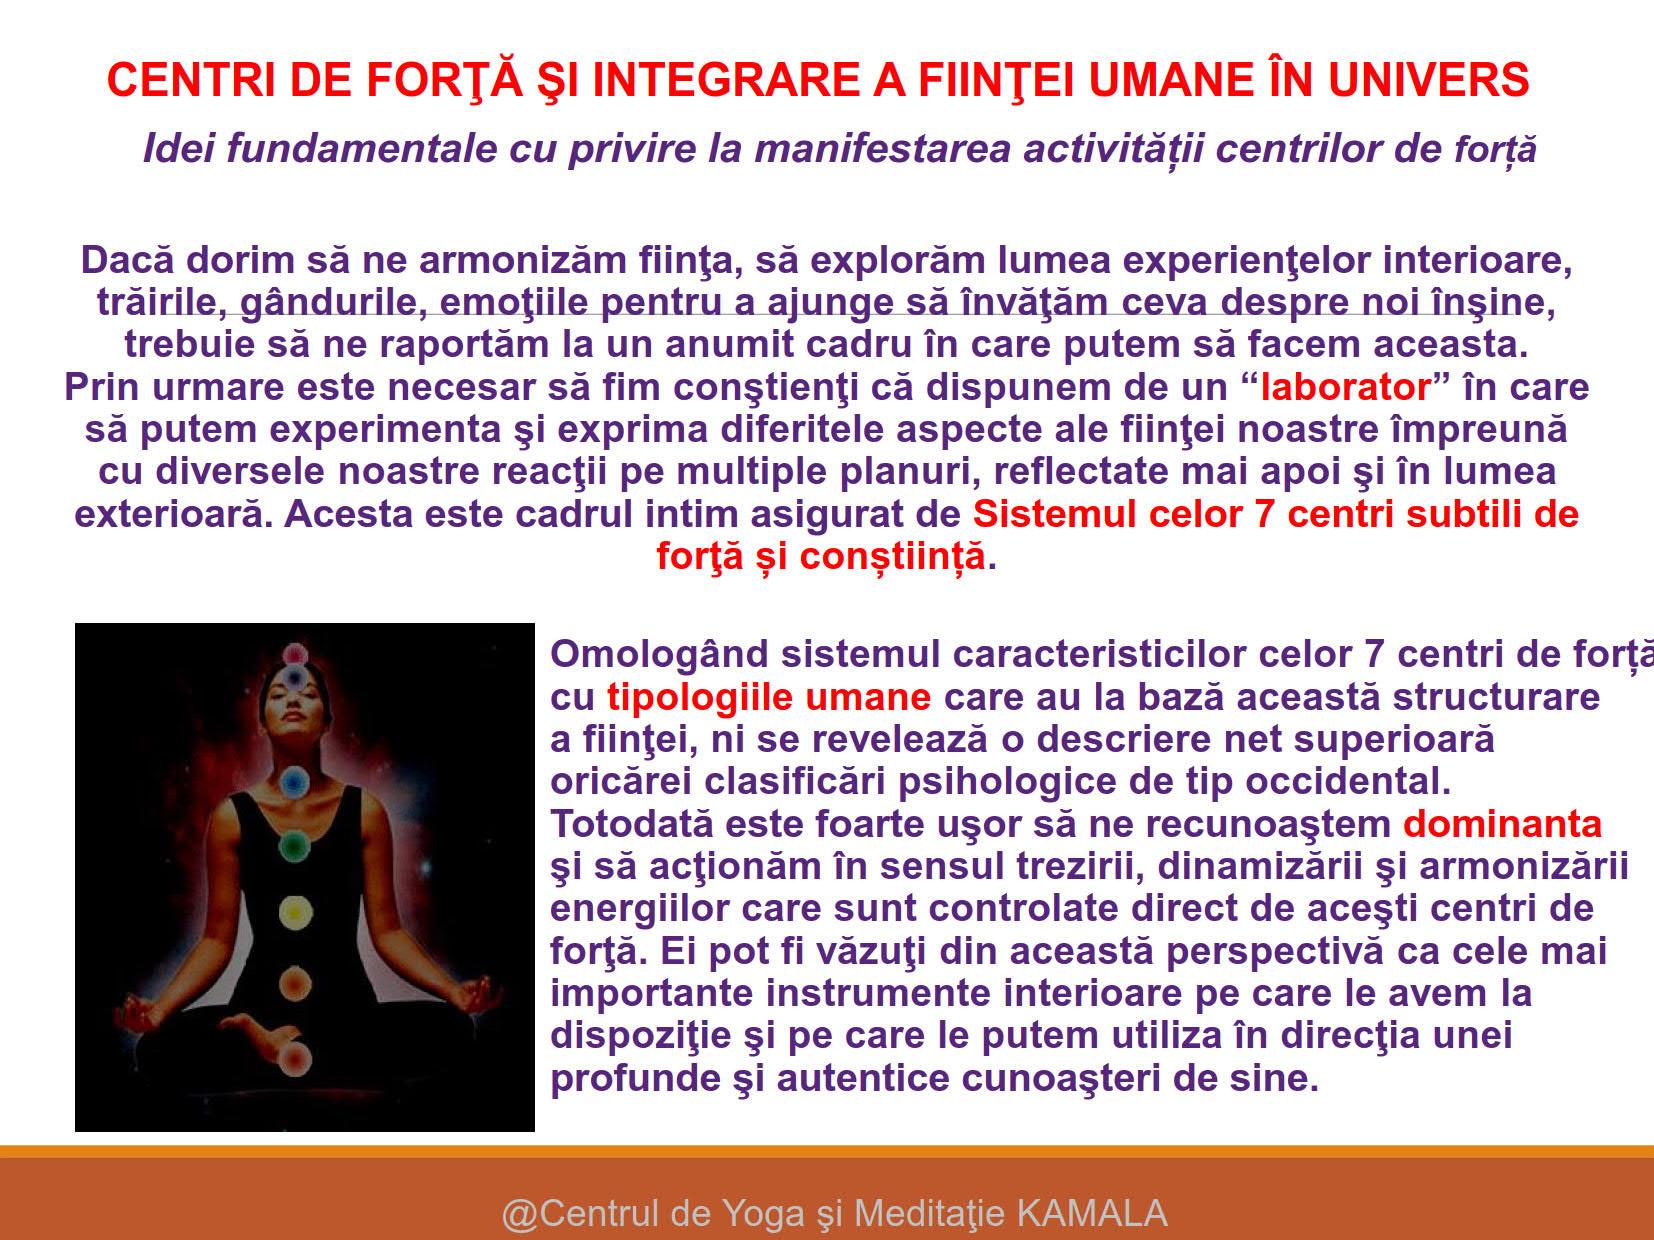 CENTRI DE FORTA - SINTEZA_8